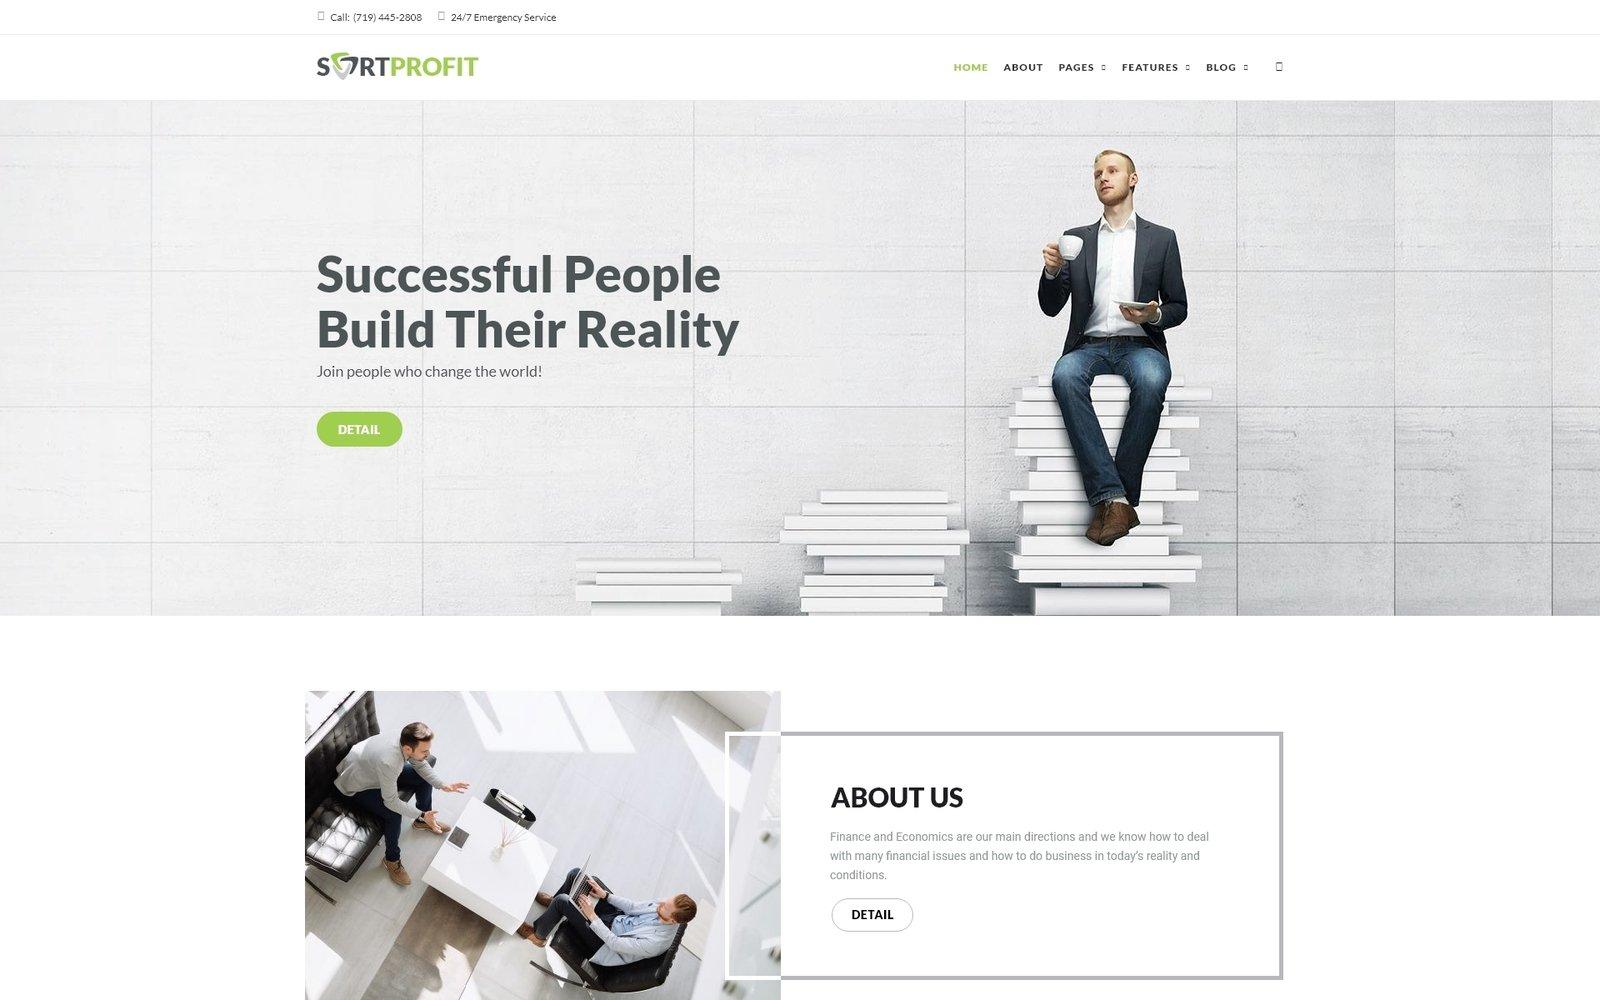 Responsive SortProfit - Business & Finance WordPress Theme #65113